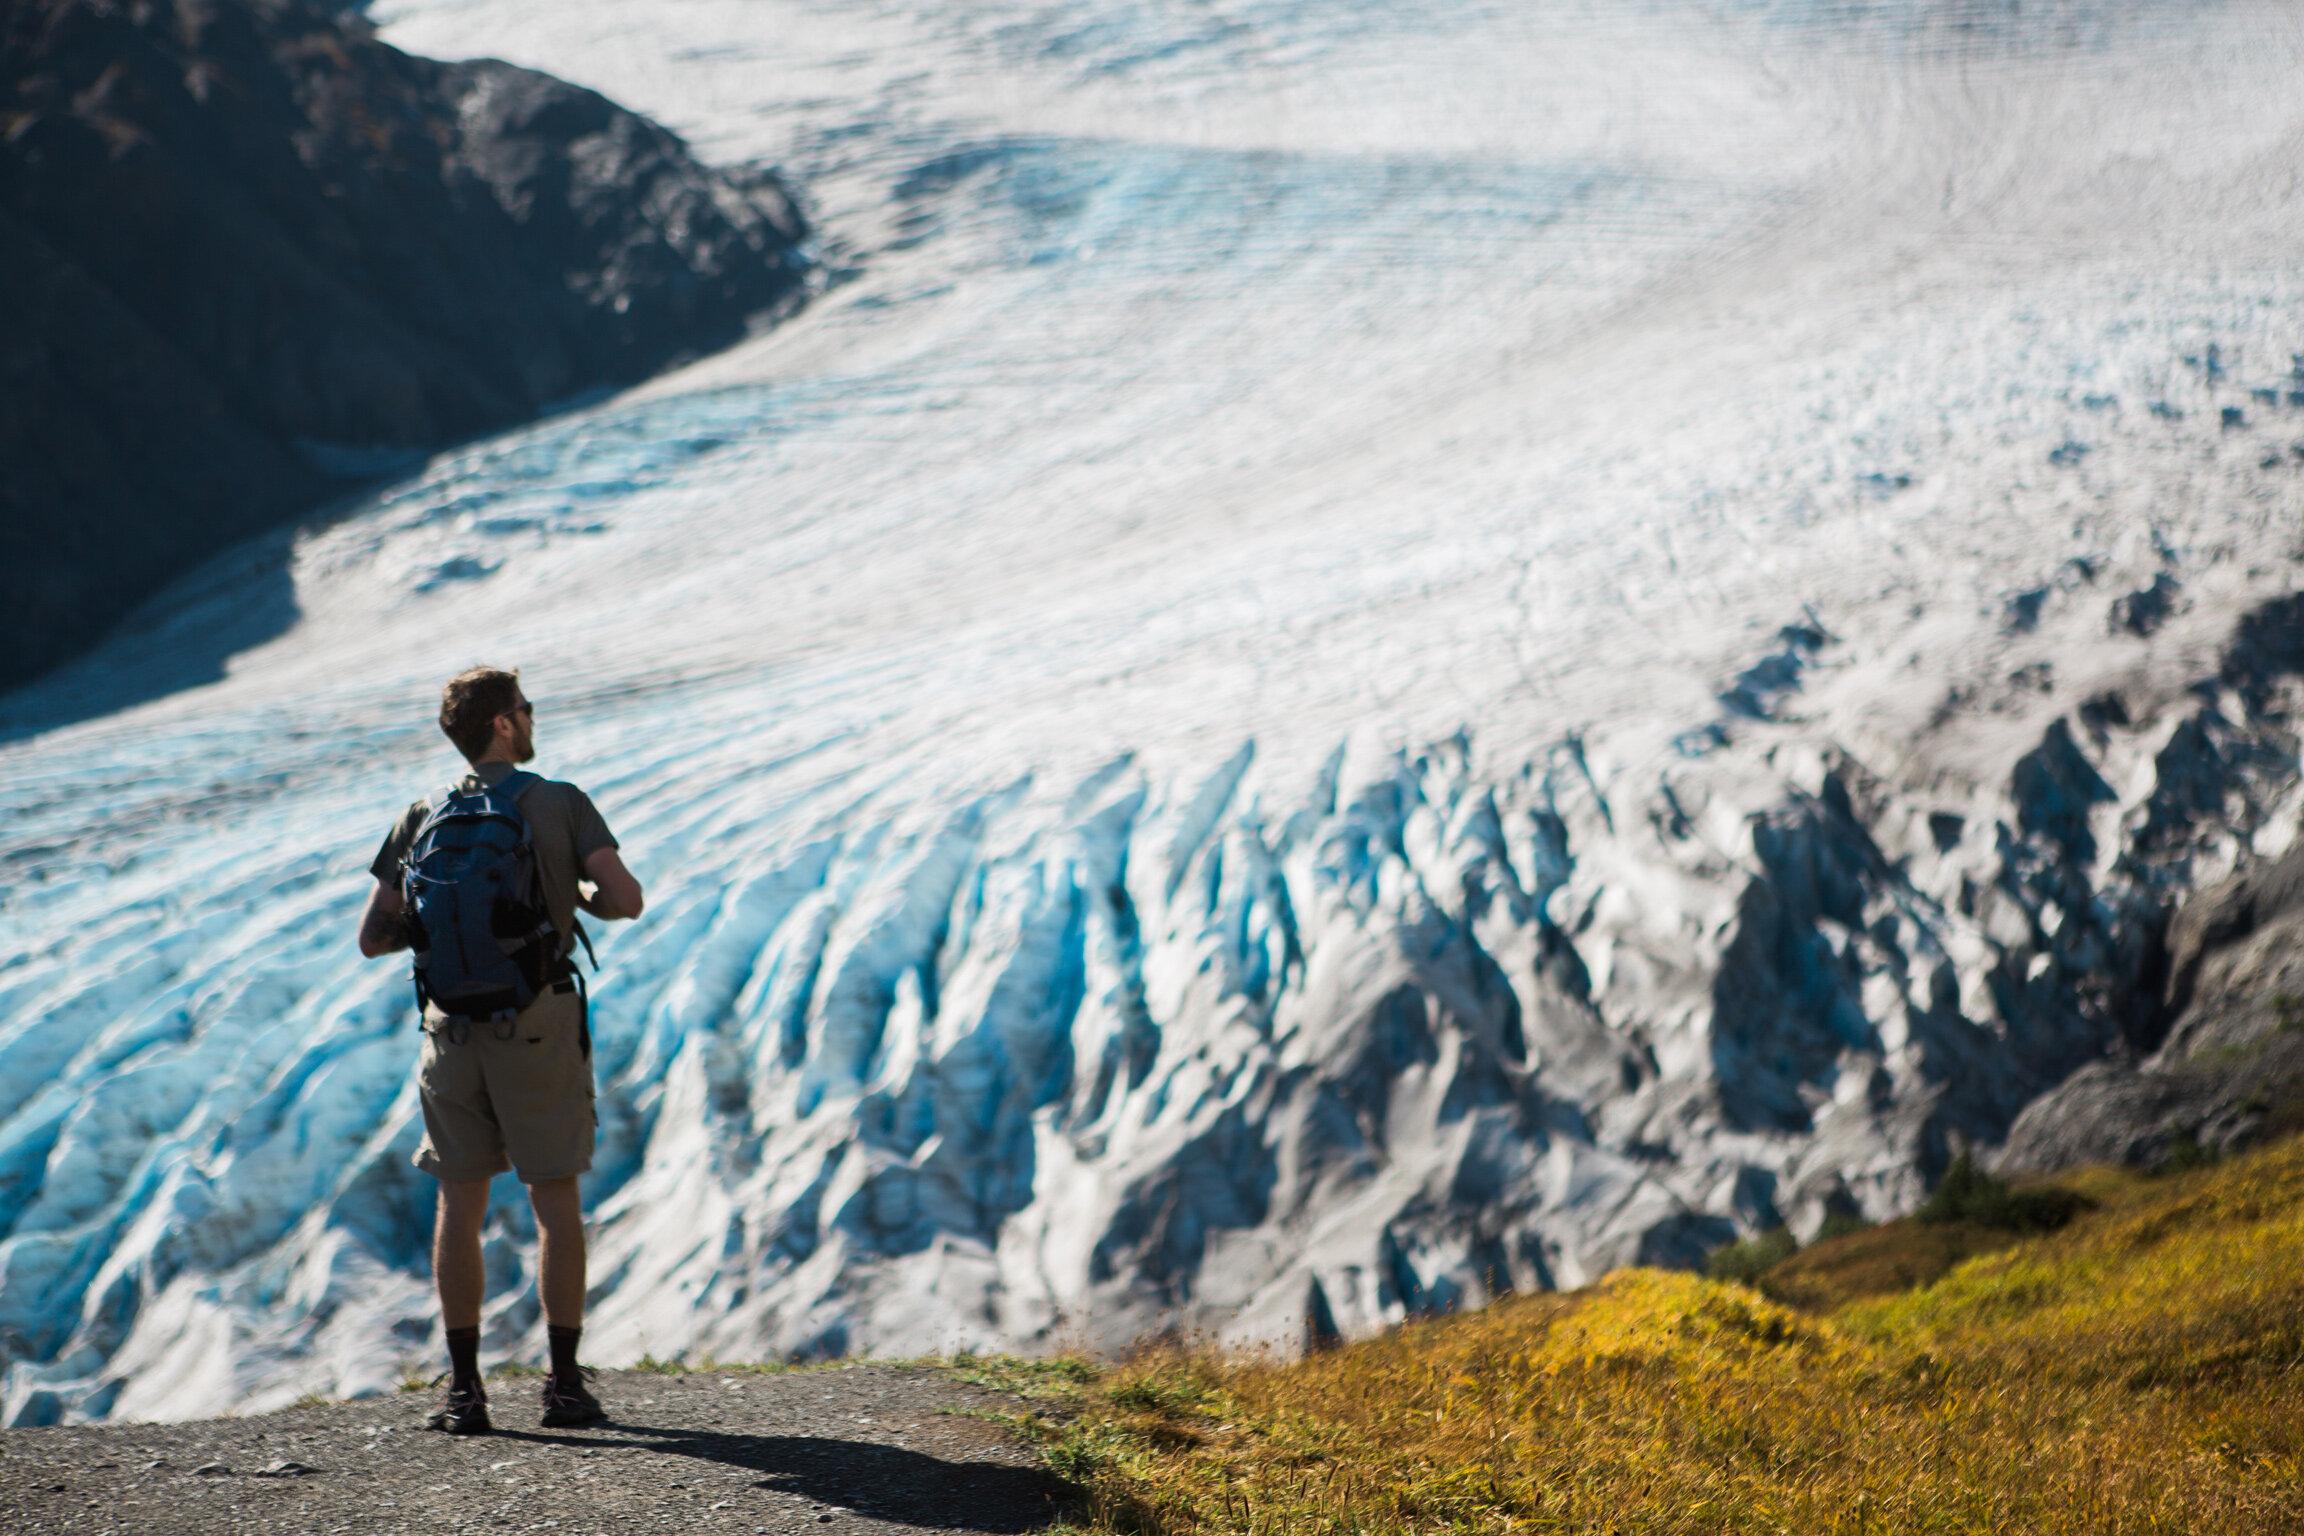 CindyGiovagnoli_Road_Trip_Travel_National_Parks_Explore_America-106.jpg